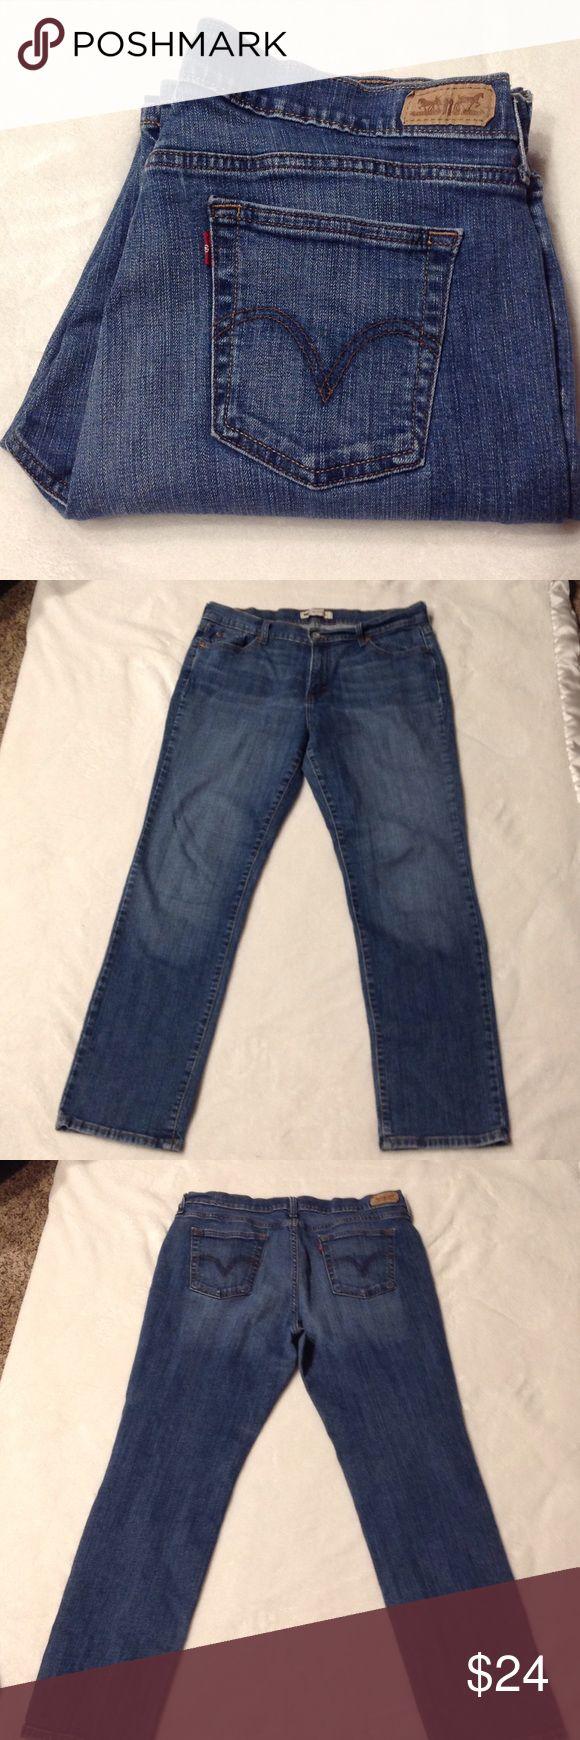 Levi 505 Straight Leg Jeans Levi's 505 straight leg jeans inseam 31 red label Levi's Jeans Straight Leg